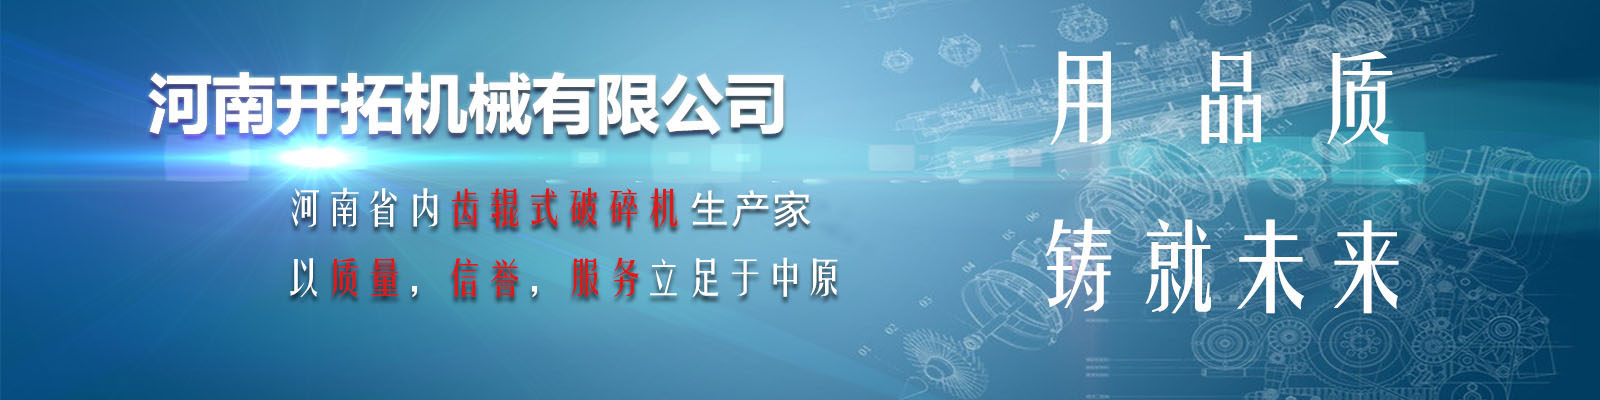 河南开拓机械(www.hnktjx.com)